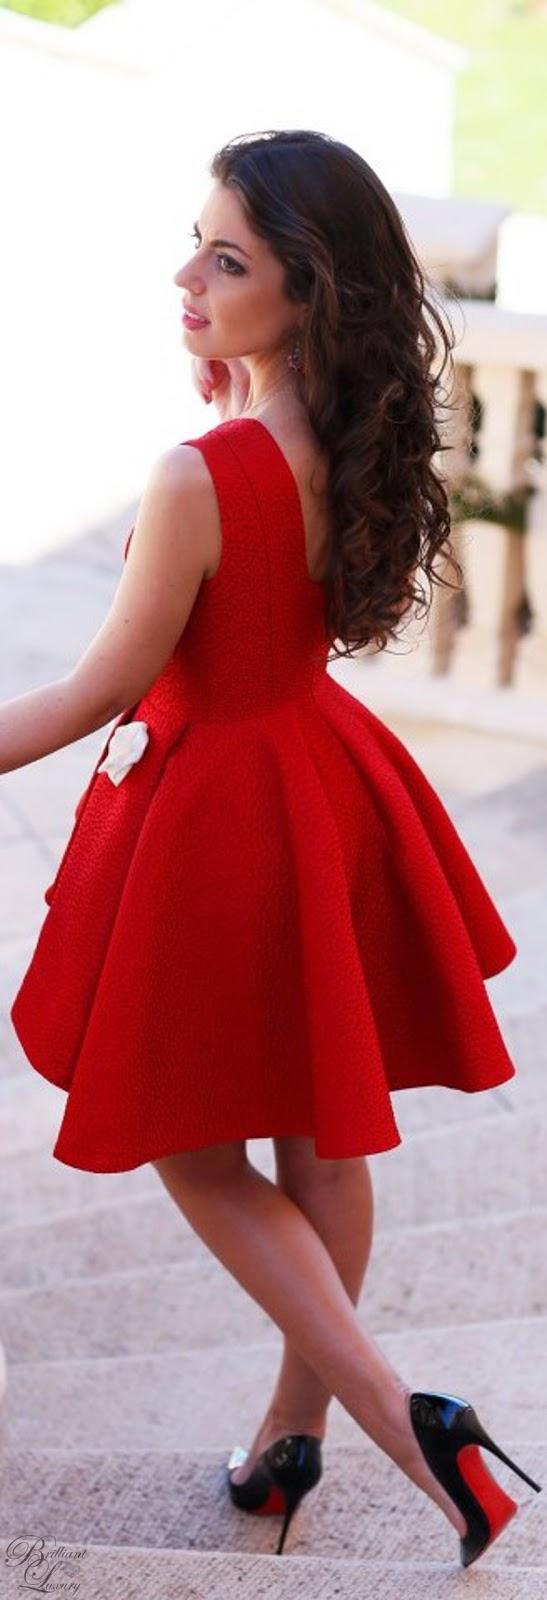 Brilliant Luxury ♦ Brilliant Luxury ♦ Silvia Navarro red Alba dress